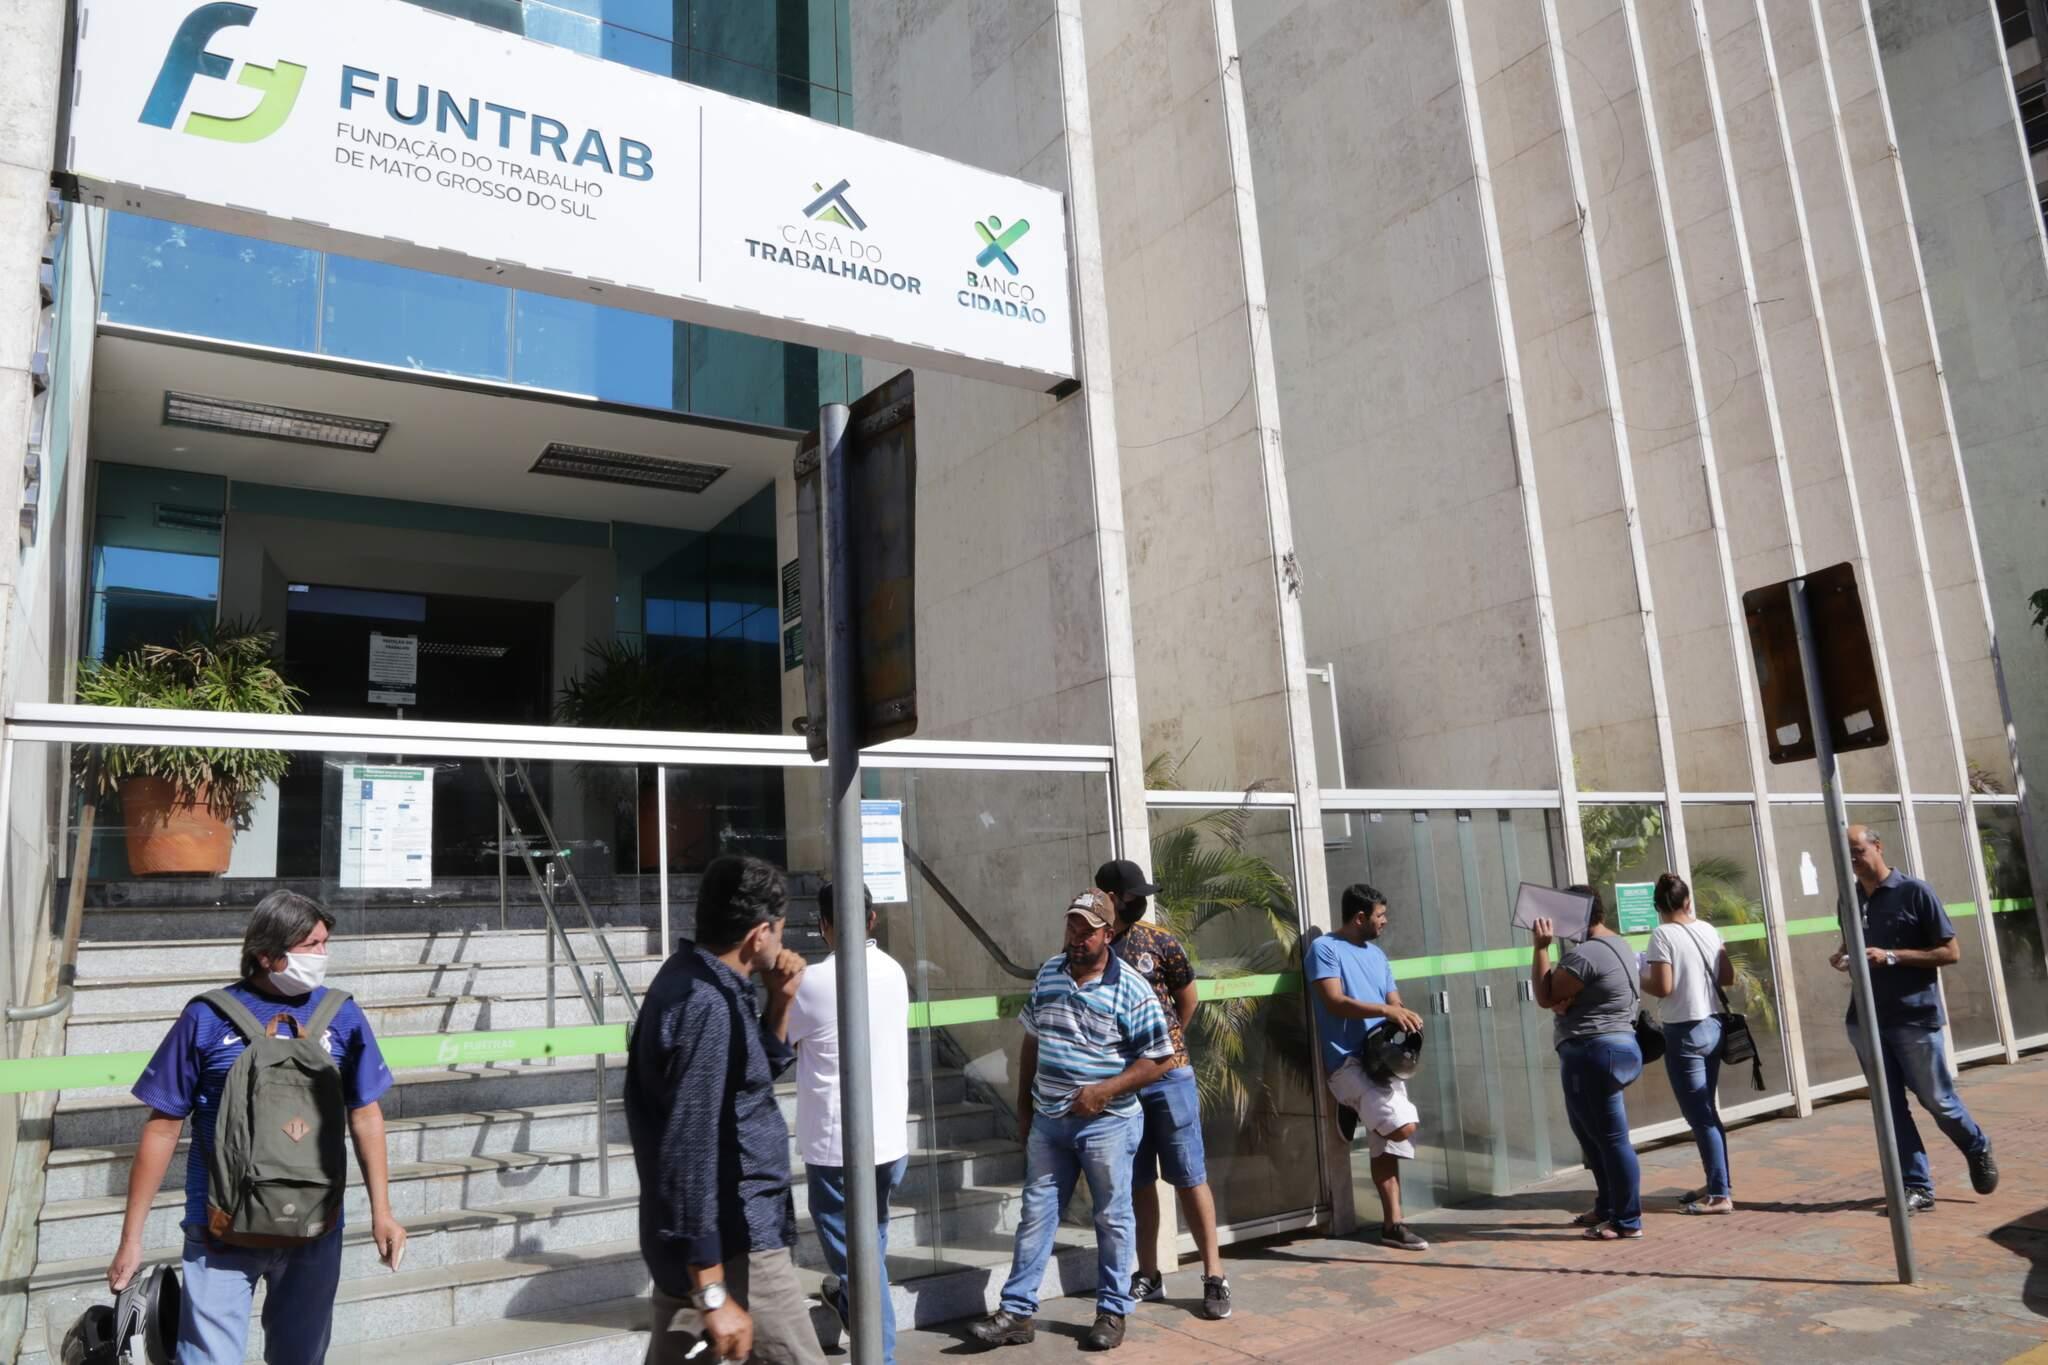 Candidatos na fila em frente à Funtrab. (Foto: Kísie Ainoã)